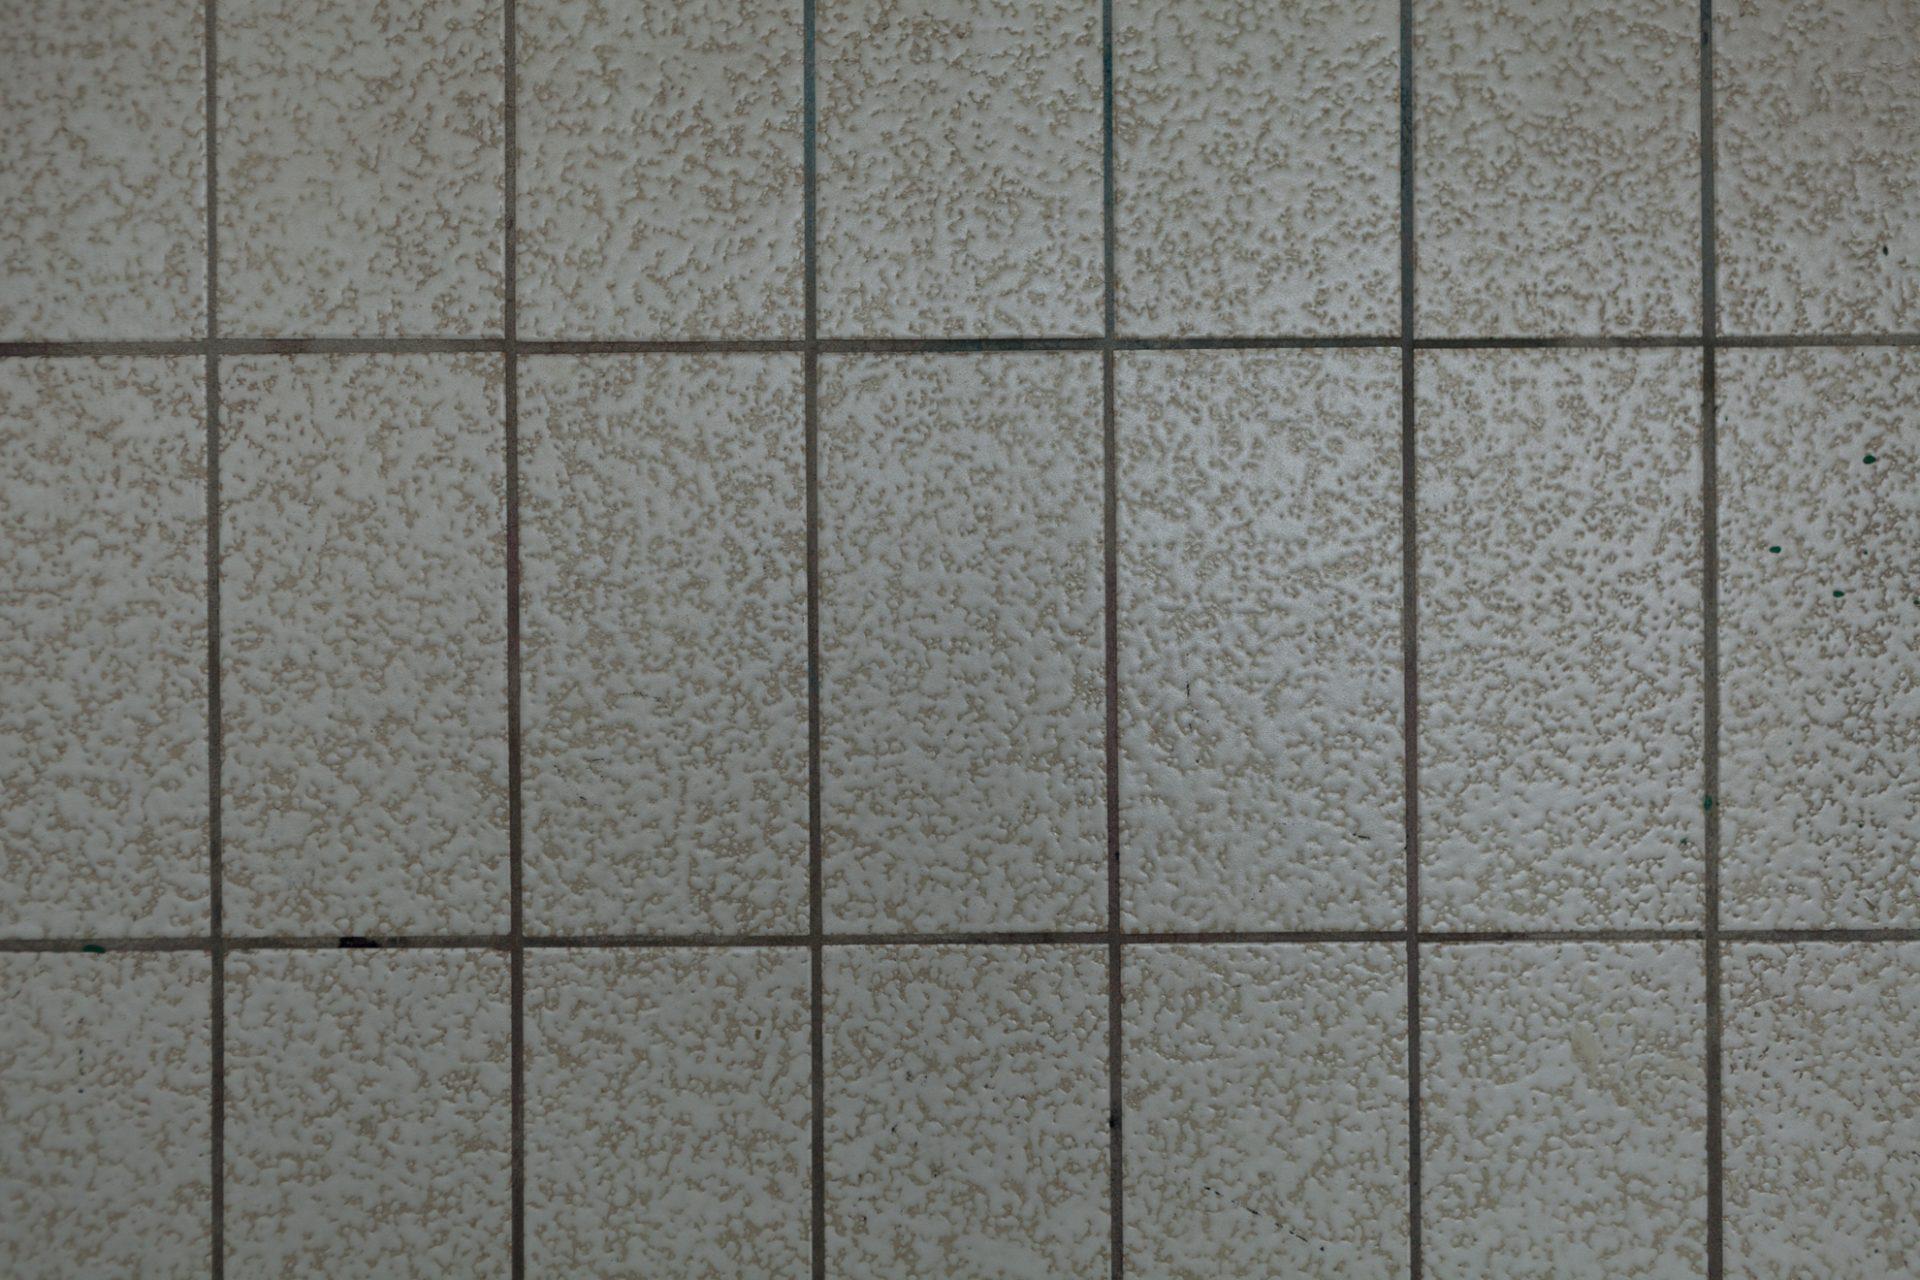 U1 – Tiles